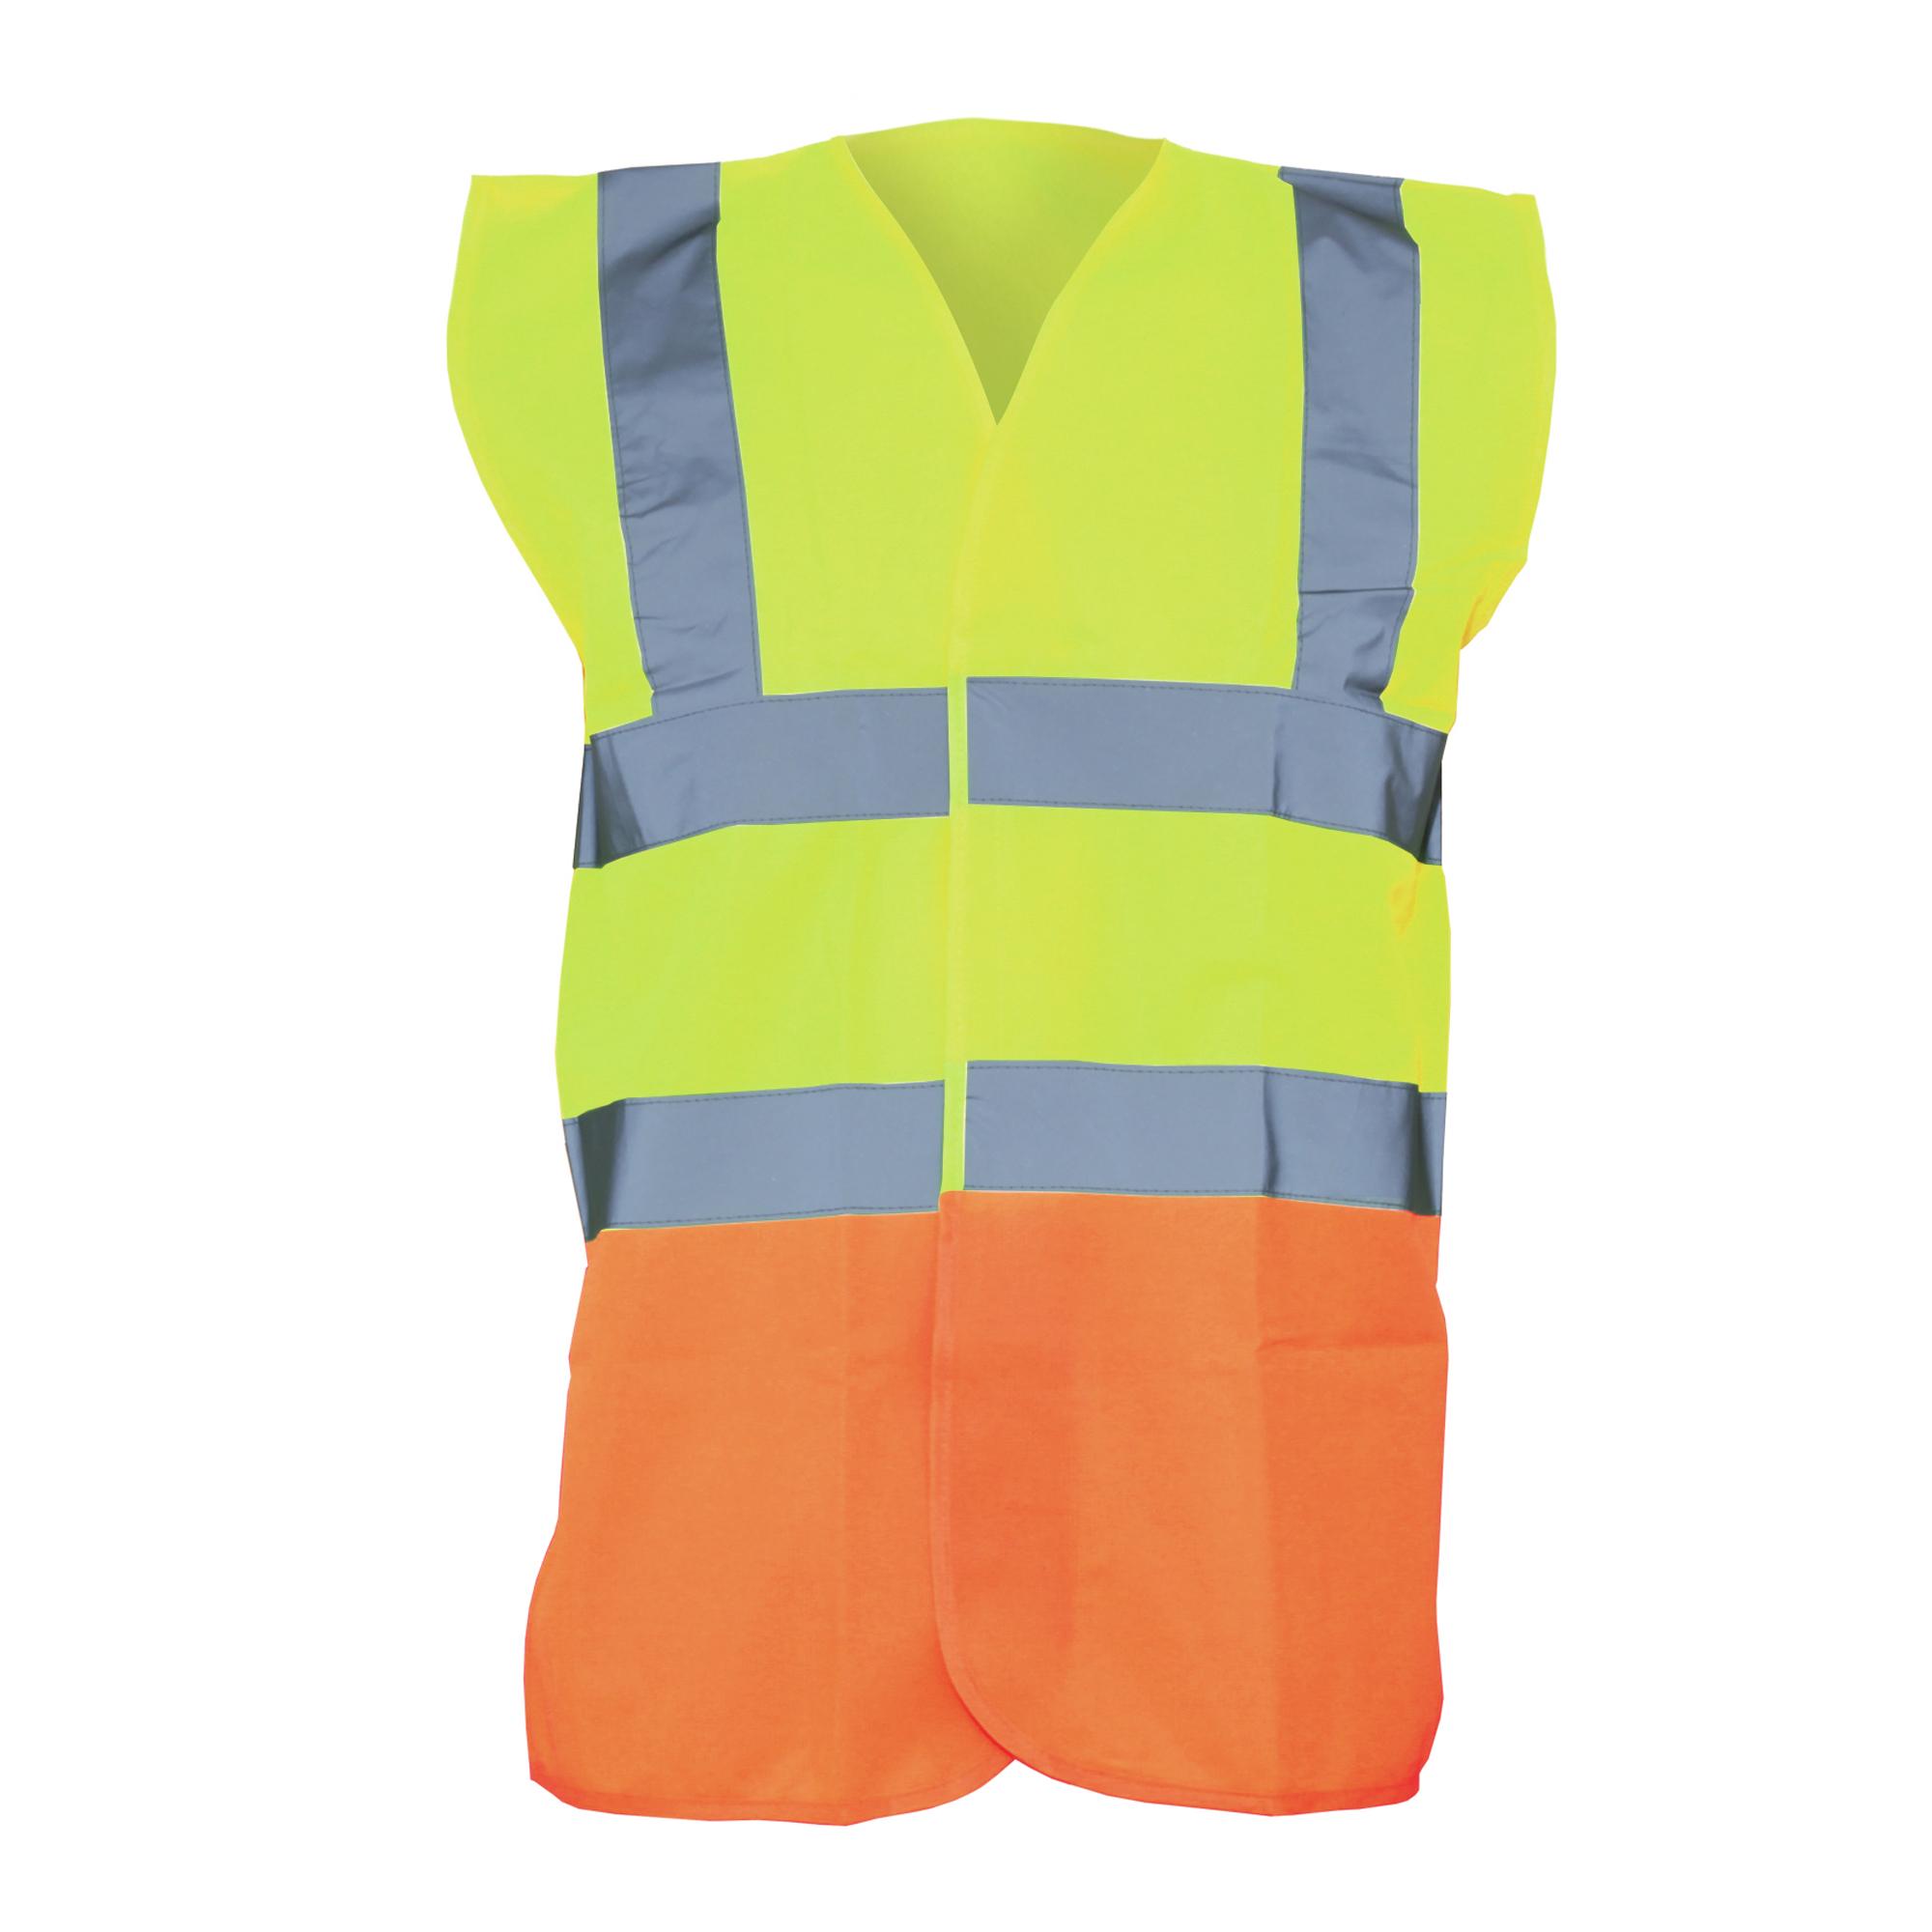 Yoko Unisex Premium Hi-Vis Waistcoat Vest / Jacket (Pack of 2) (S) (Hi Vis Yellow/Orange)